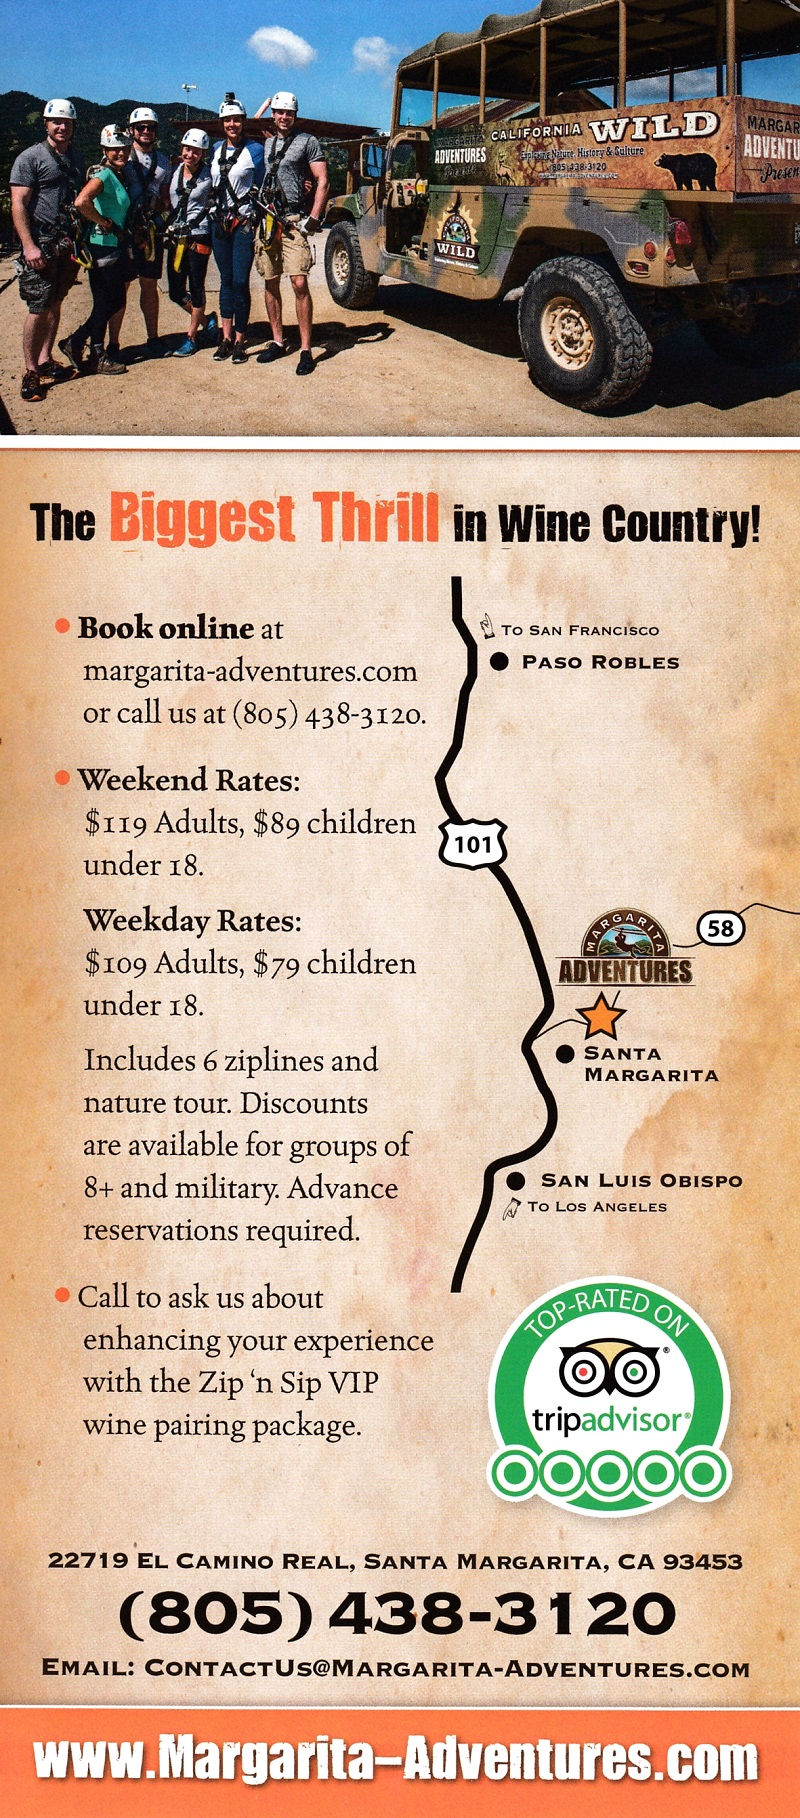 Zipline in the Wine Country brochure thumbnail